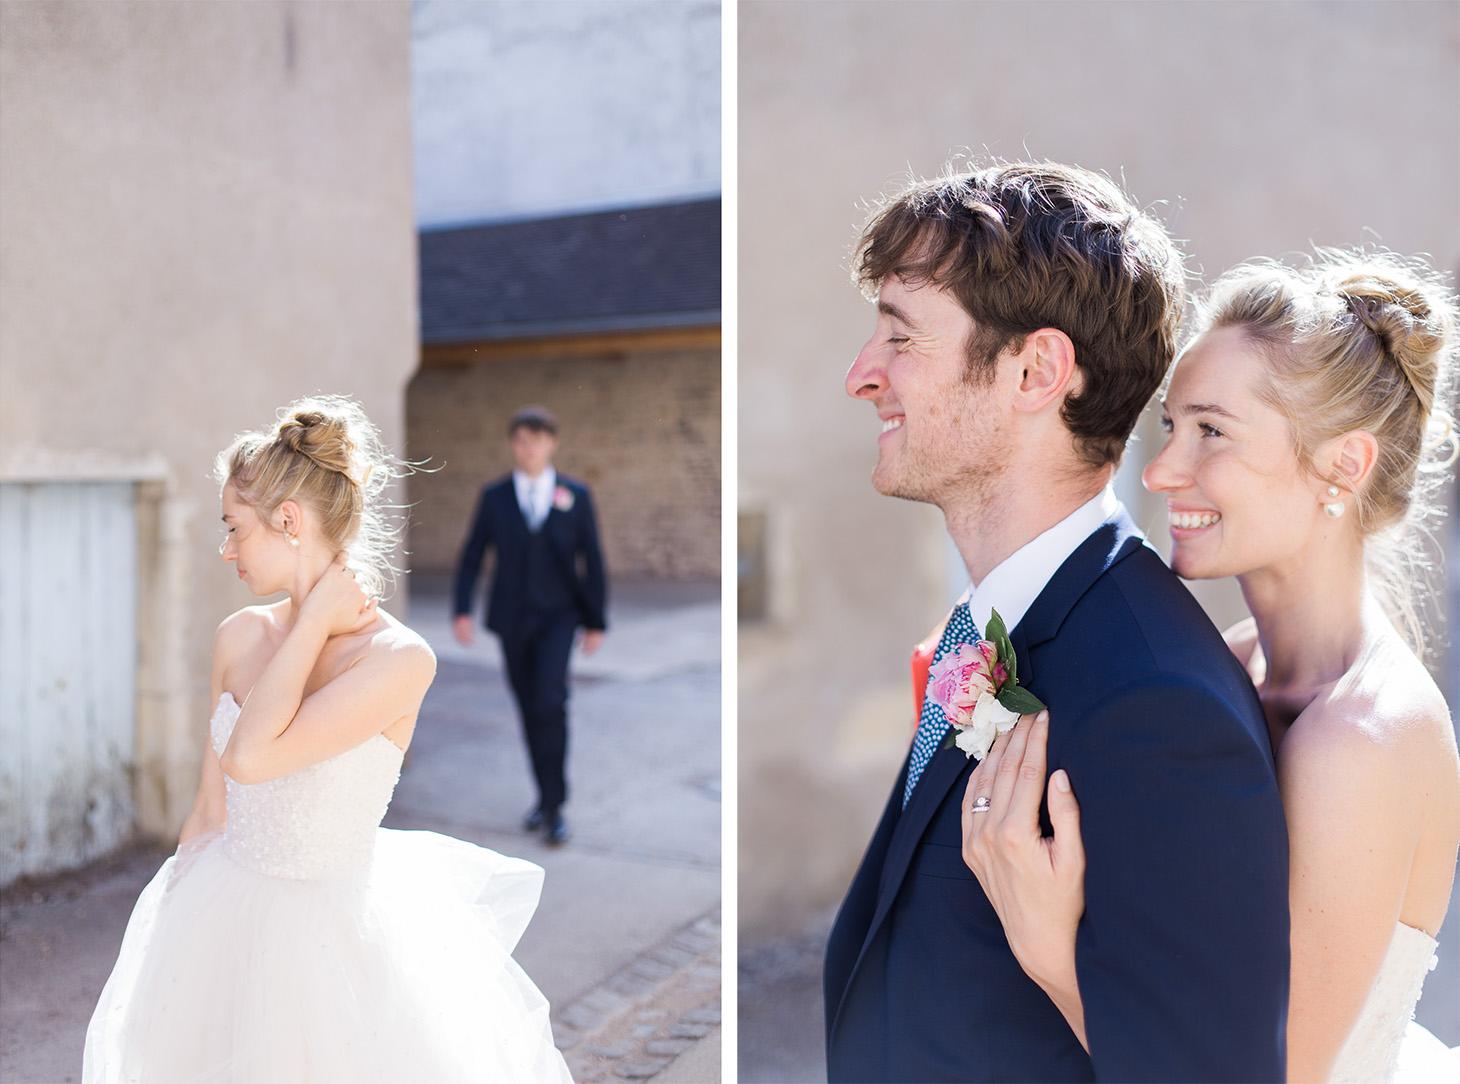 bourgogne_wedding_photographer_chateau_pommard-060 copie